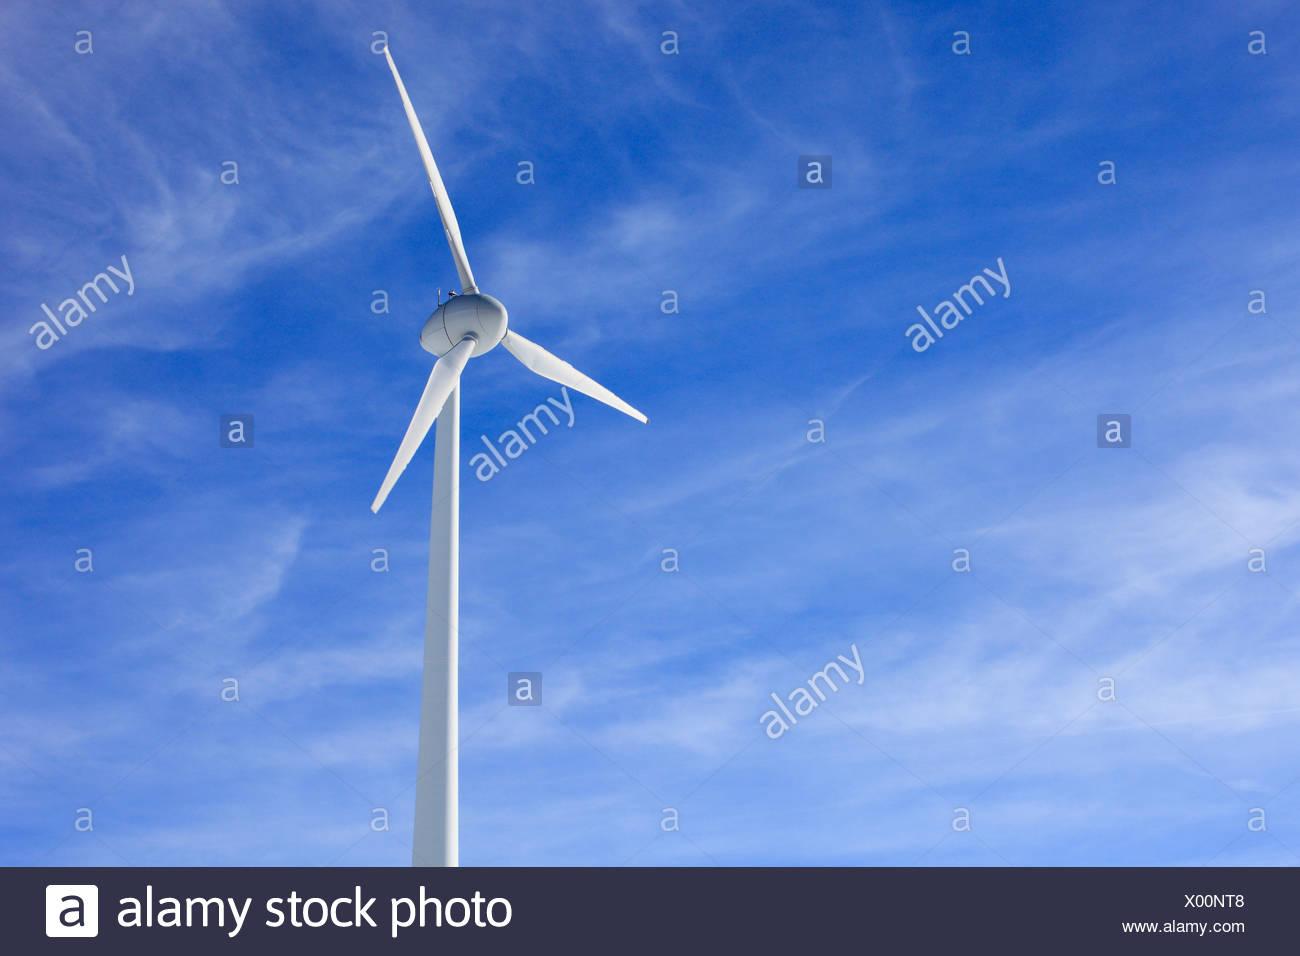 Alternative Energien, Andermatt, Energie, Himmel, Natur, Naturschutz, Rad, Schweiz, Europa, Energie, Strom, Umwelt Stockbild